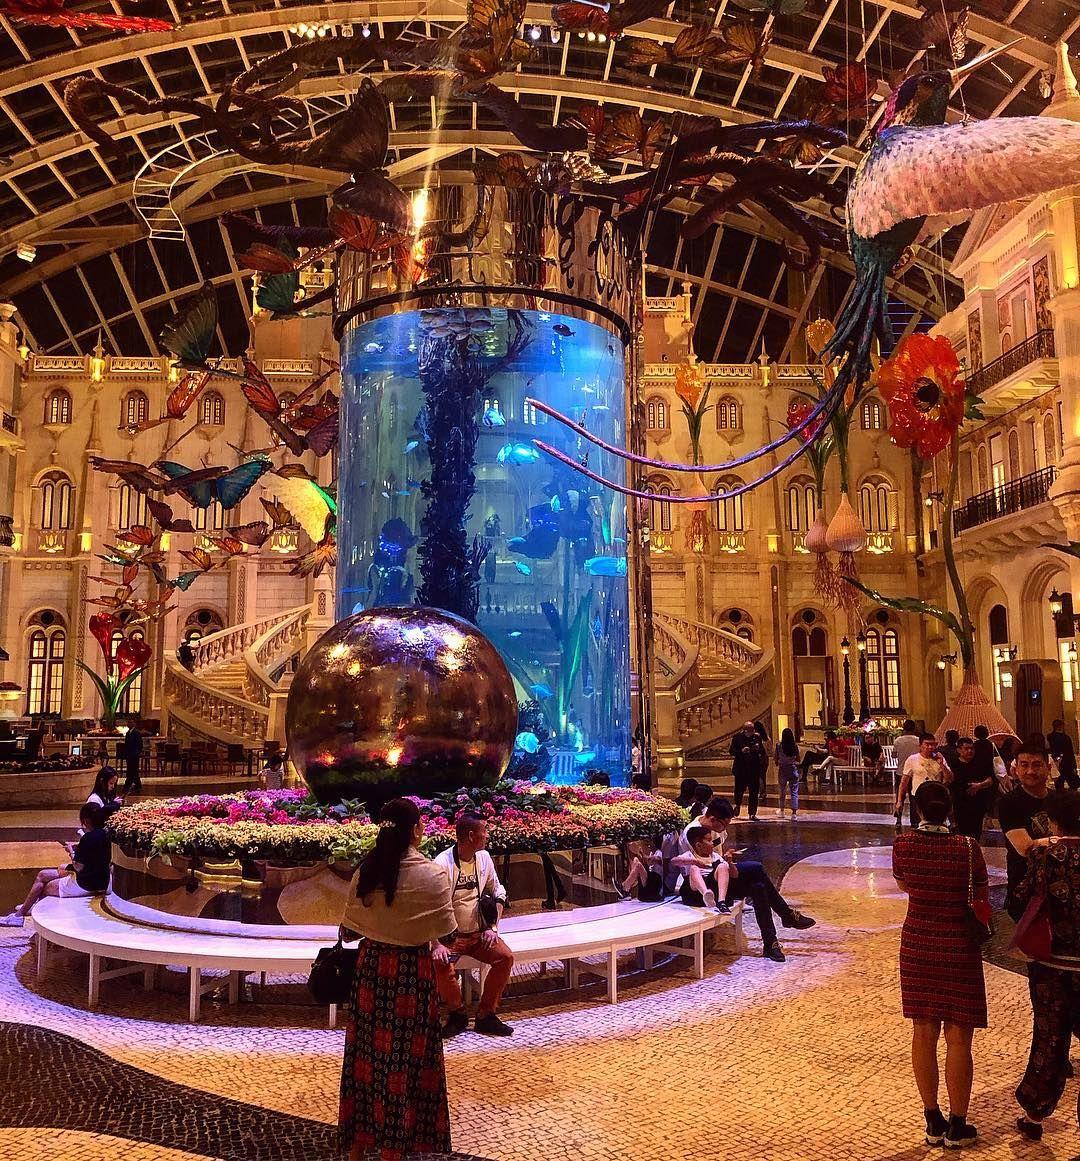 Mgm Hotel Lobby Aquarium Macau Hotel Lobby Amazing Fish Mgmgrand Casino City Mgm Hotel Lobby Aquarium Macau Hotel L Mgm Hotel Lobby Hotel